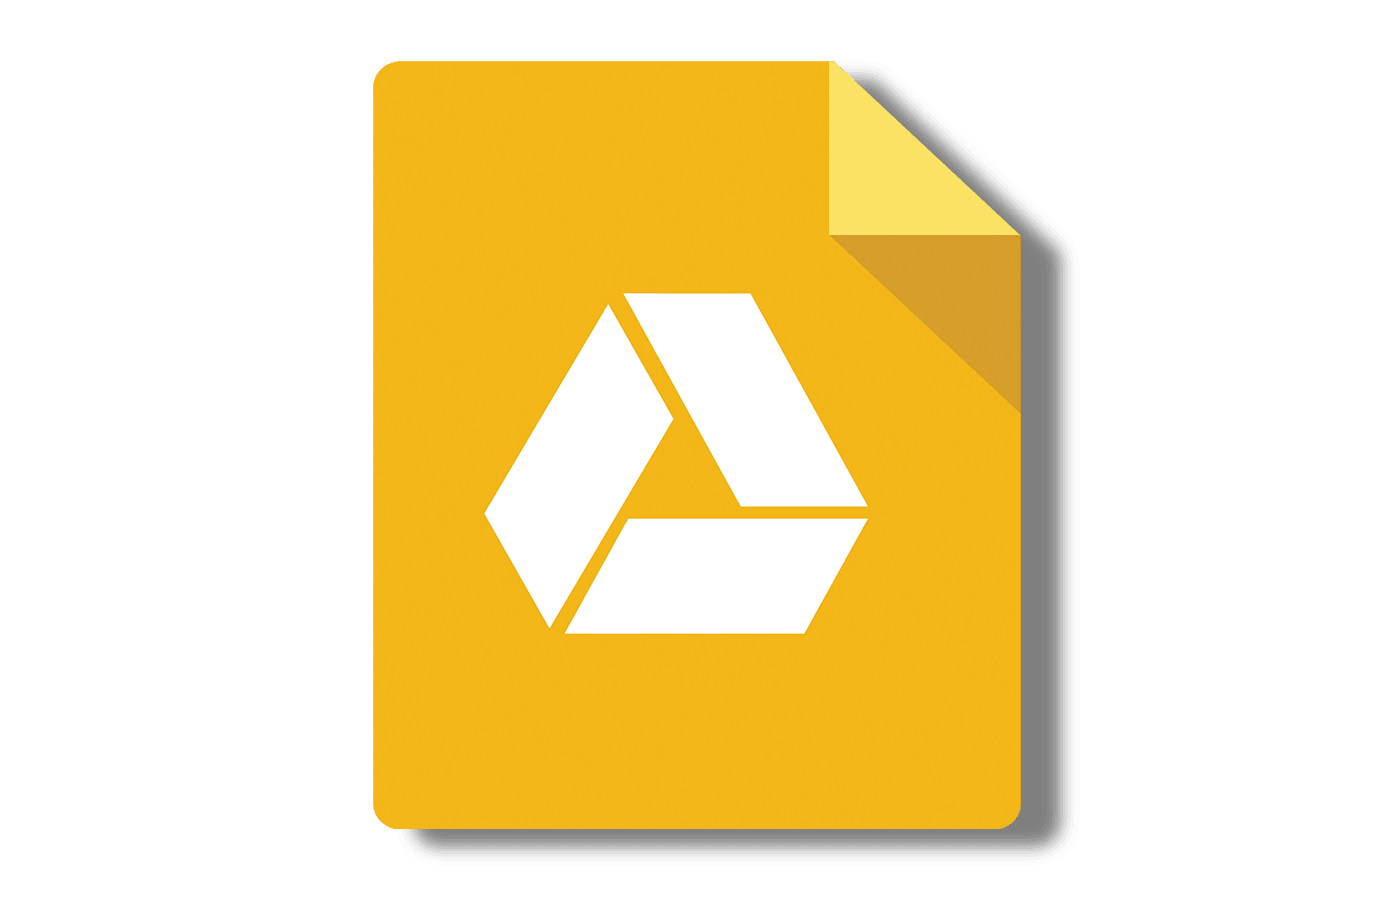 Google slides png. Download ico drive free